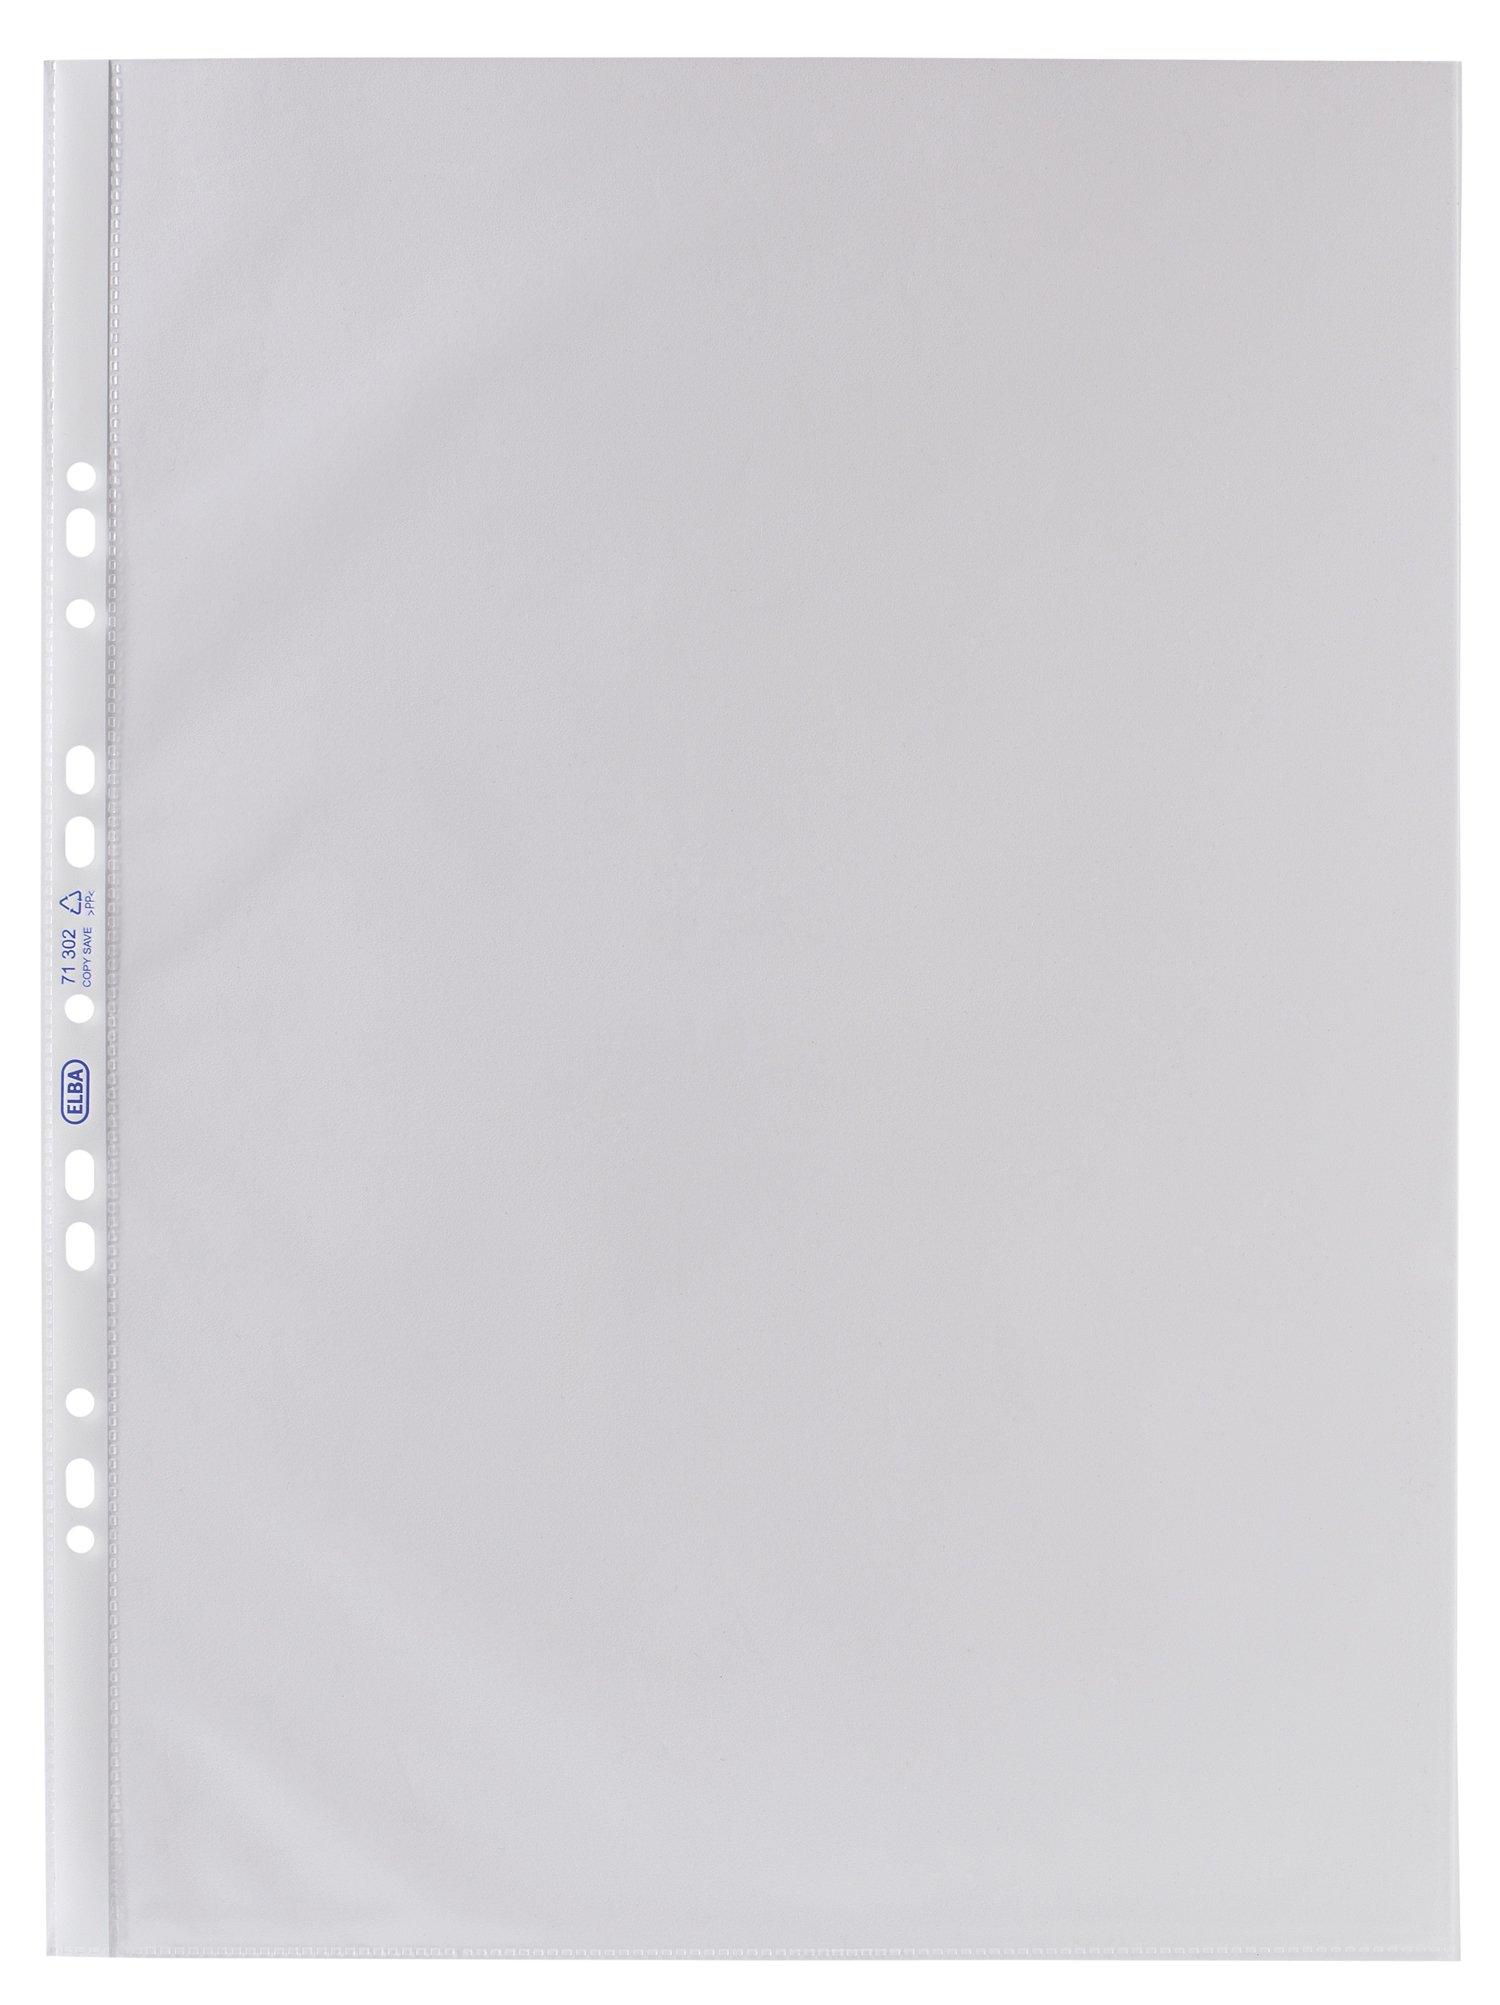 Elba Punched Pockets - Paquete de 25 portafolios de plástico, transparente product image